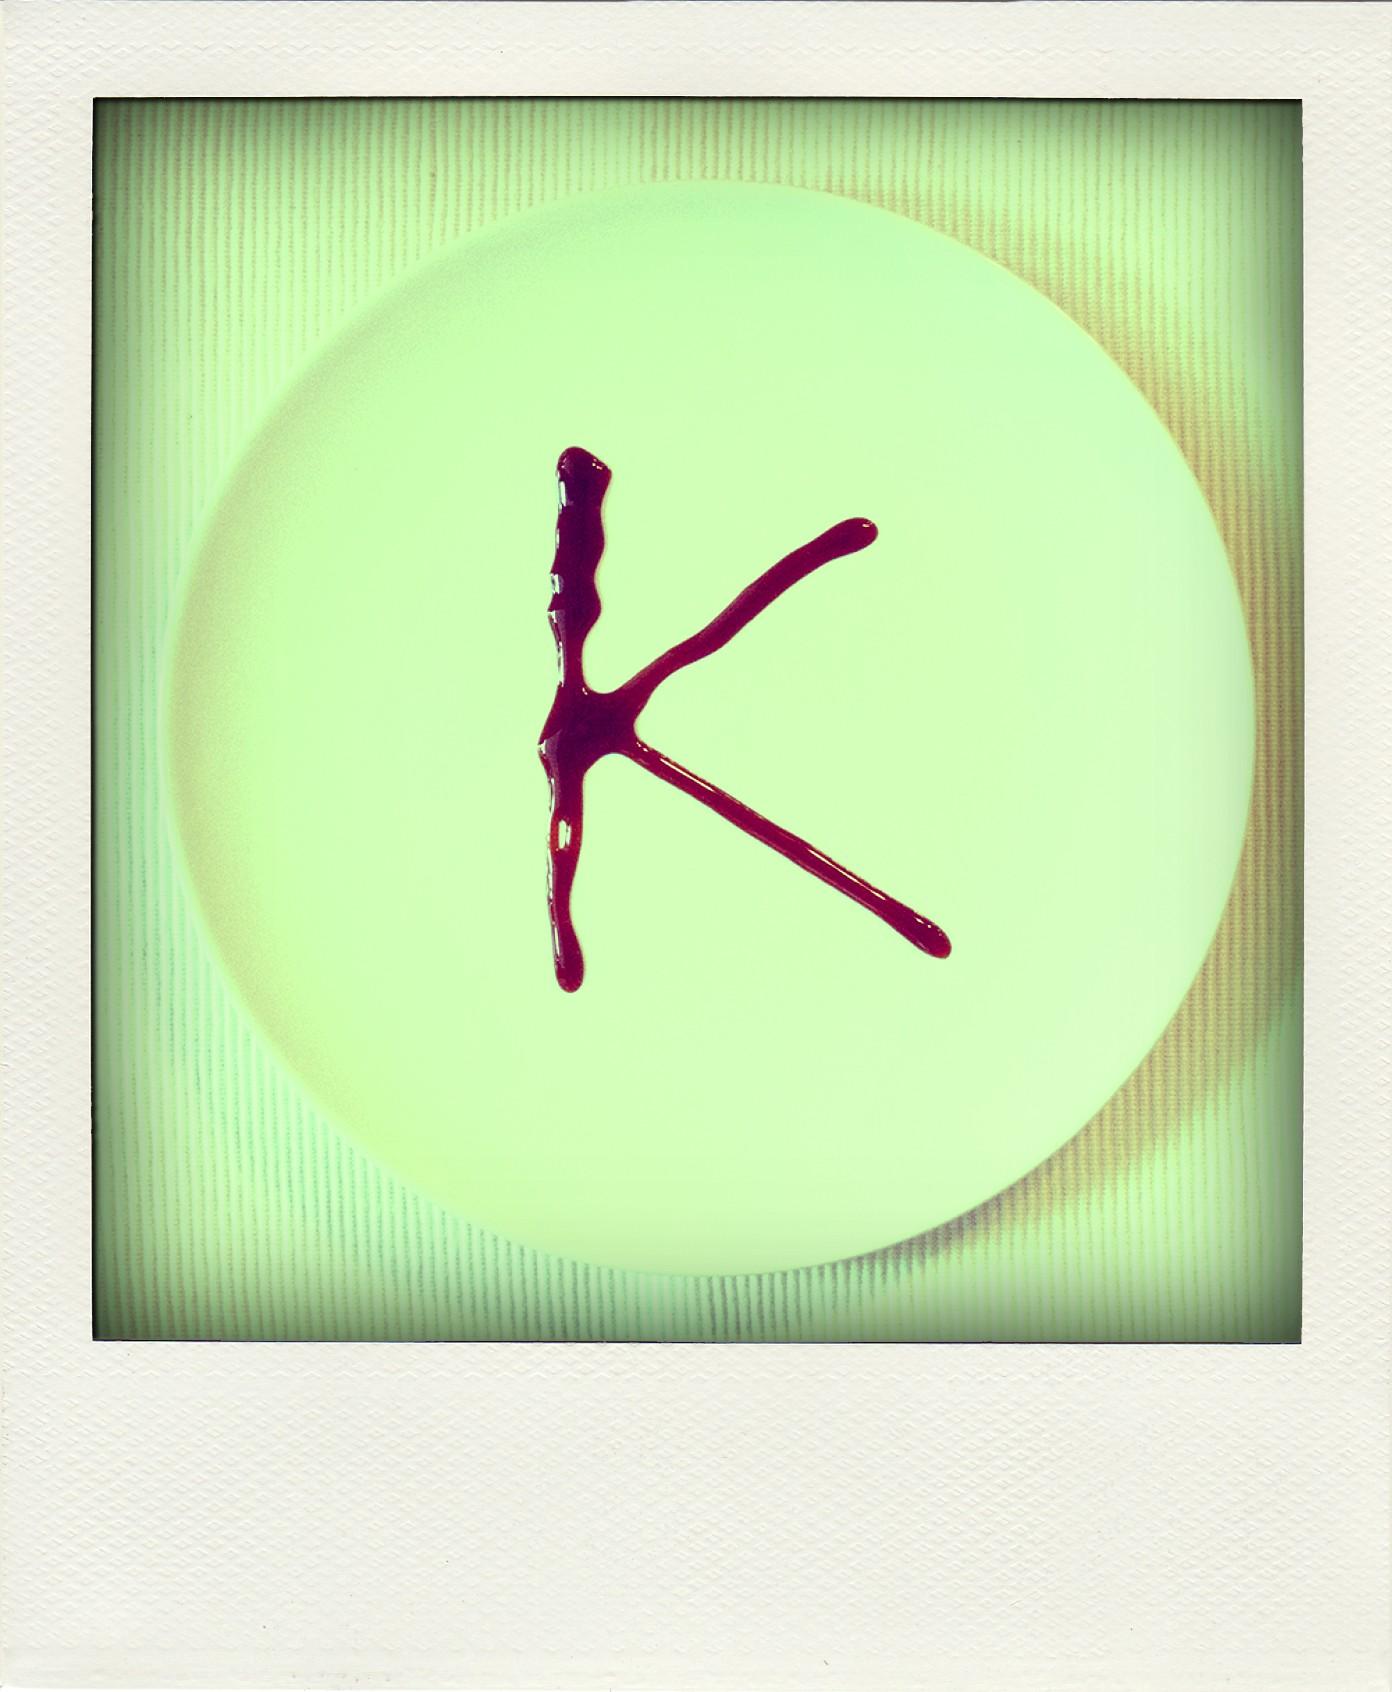 Vegan ABC - K